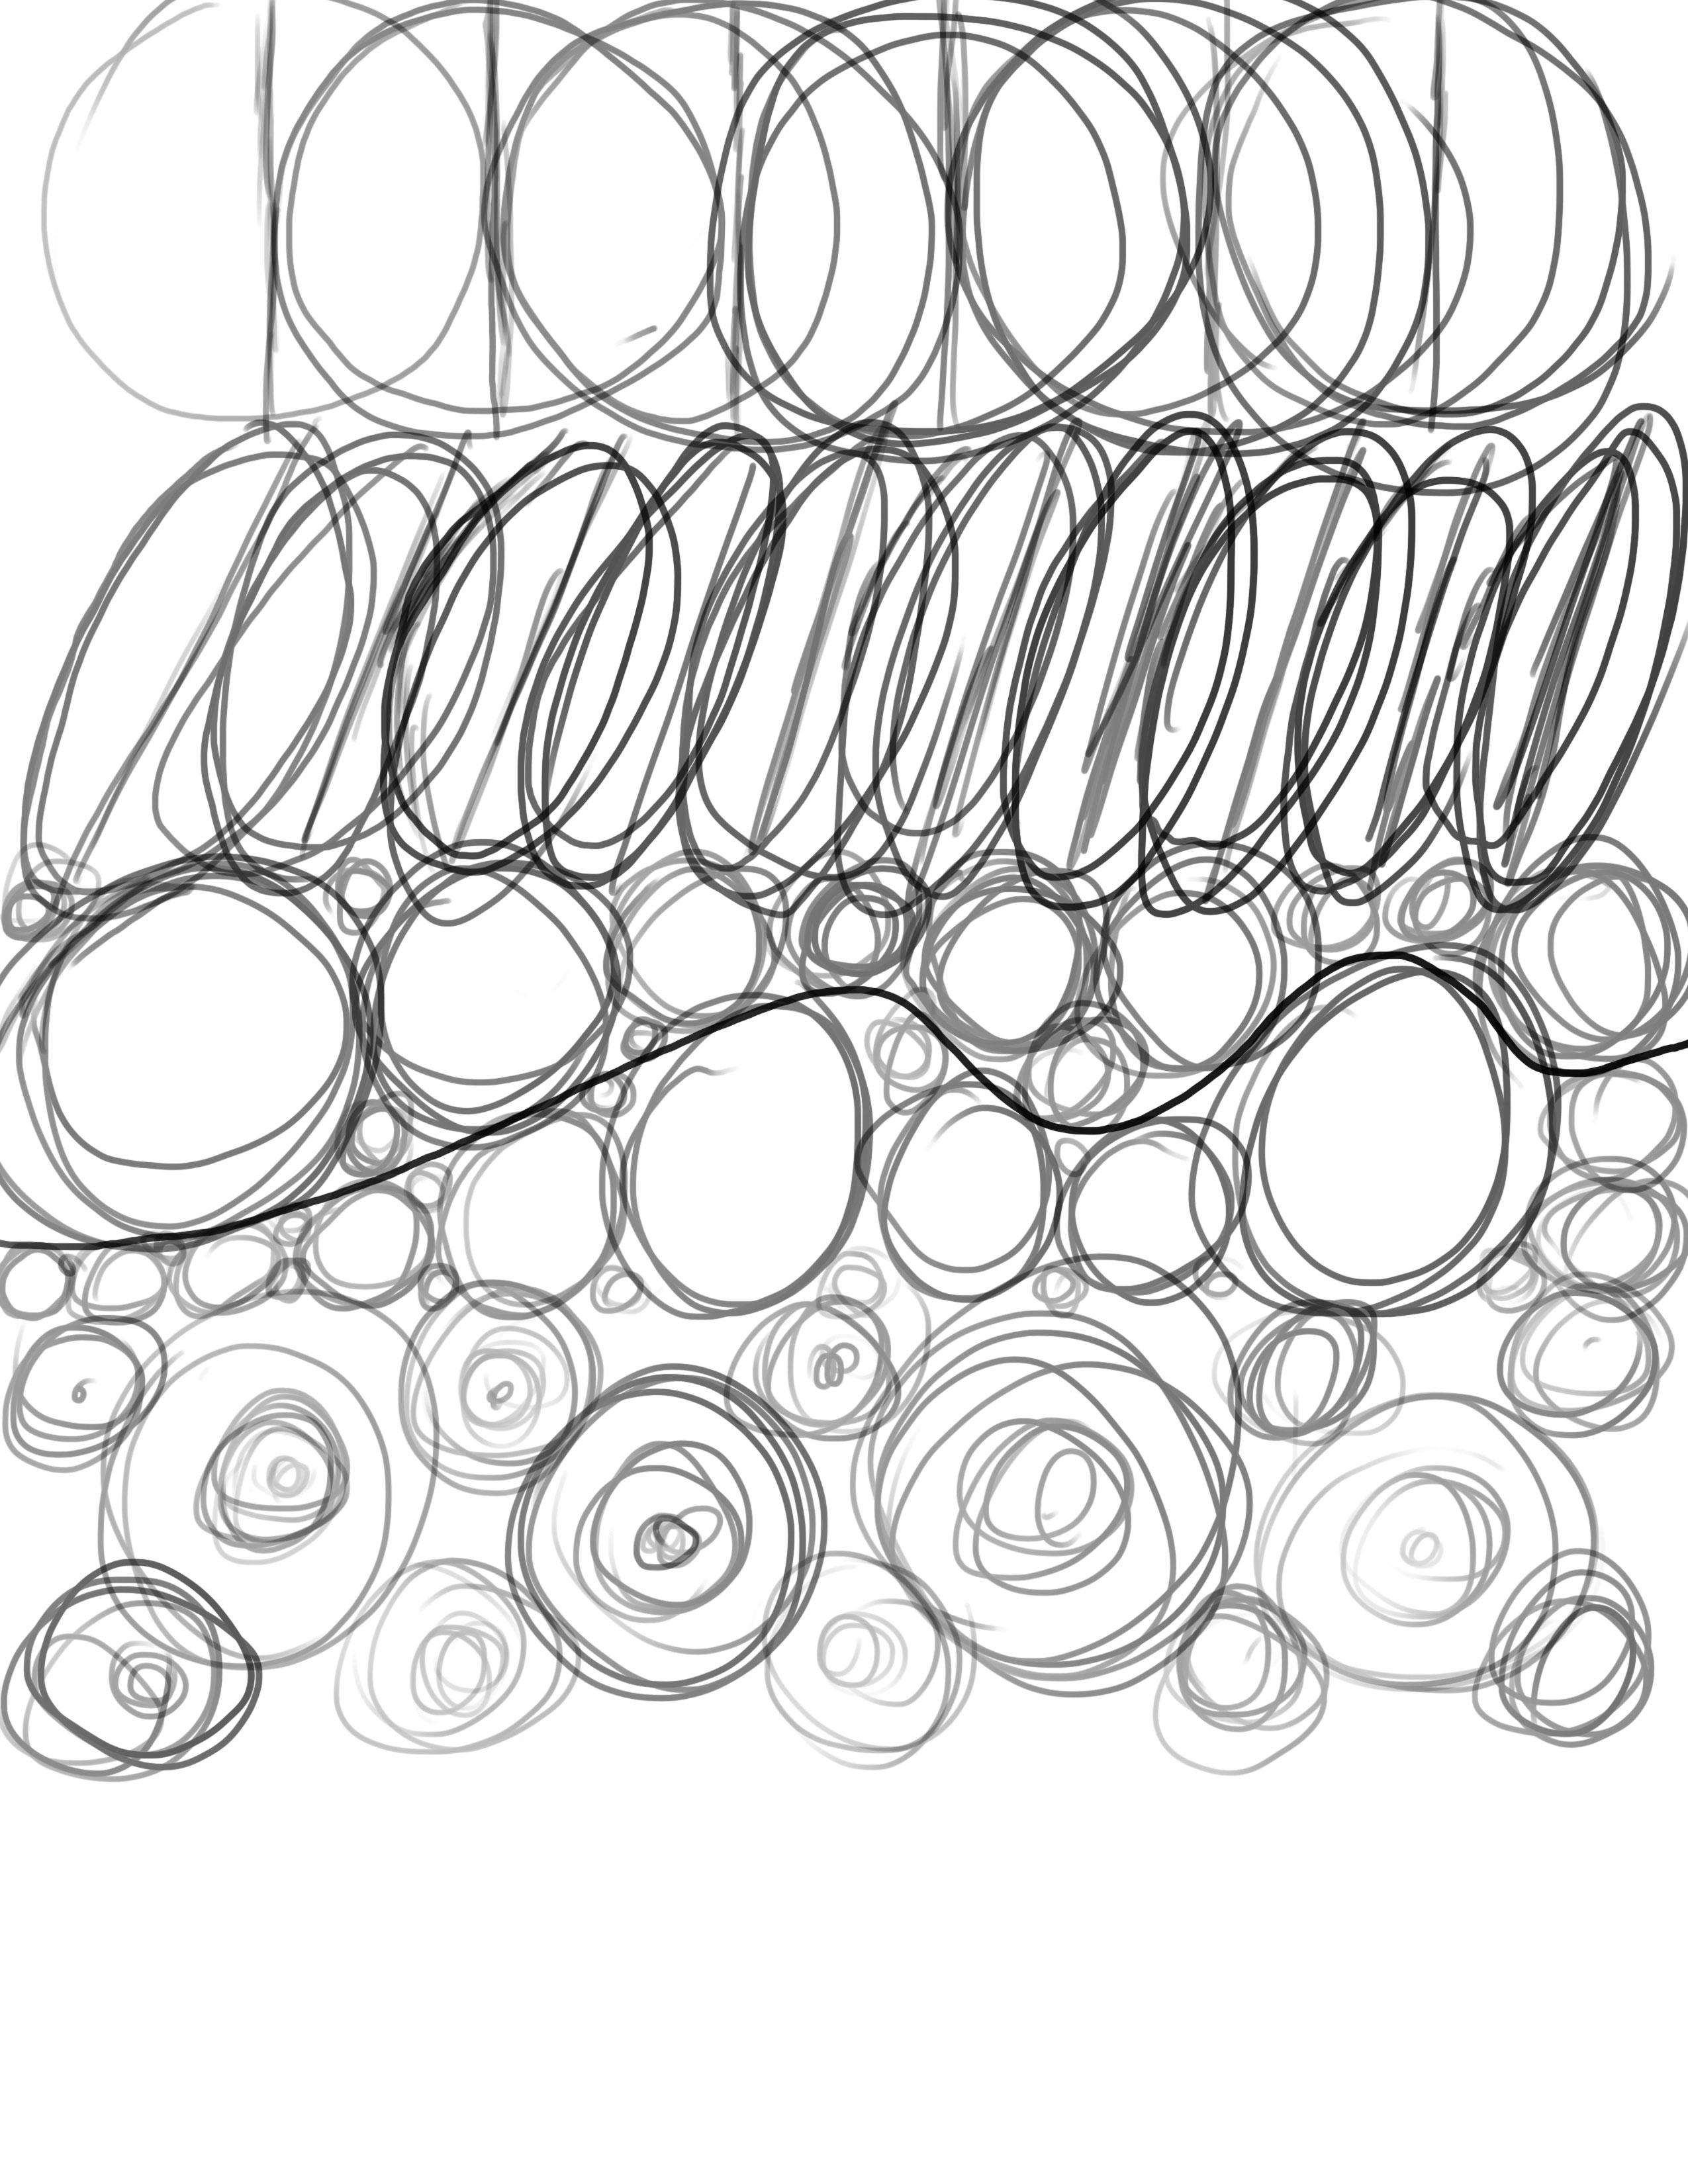 Drawing Smooth Lines Quiz : Digital drawing practice streak club